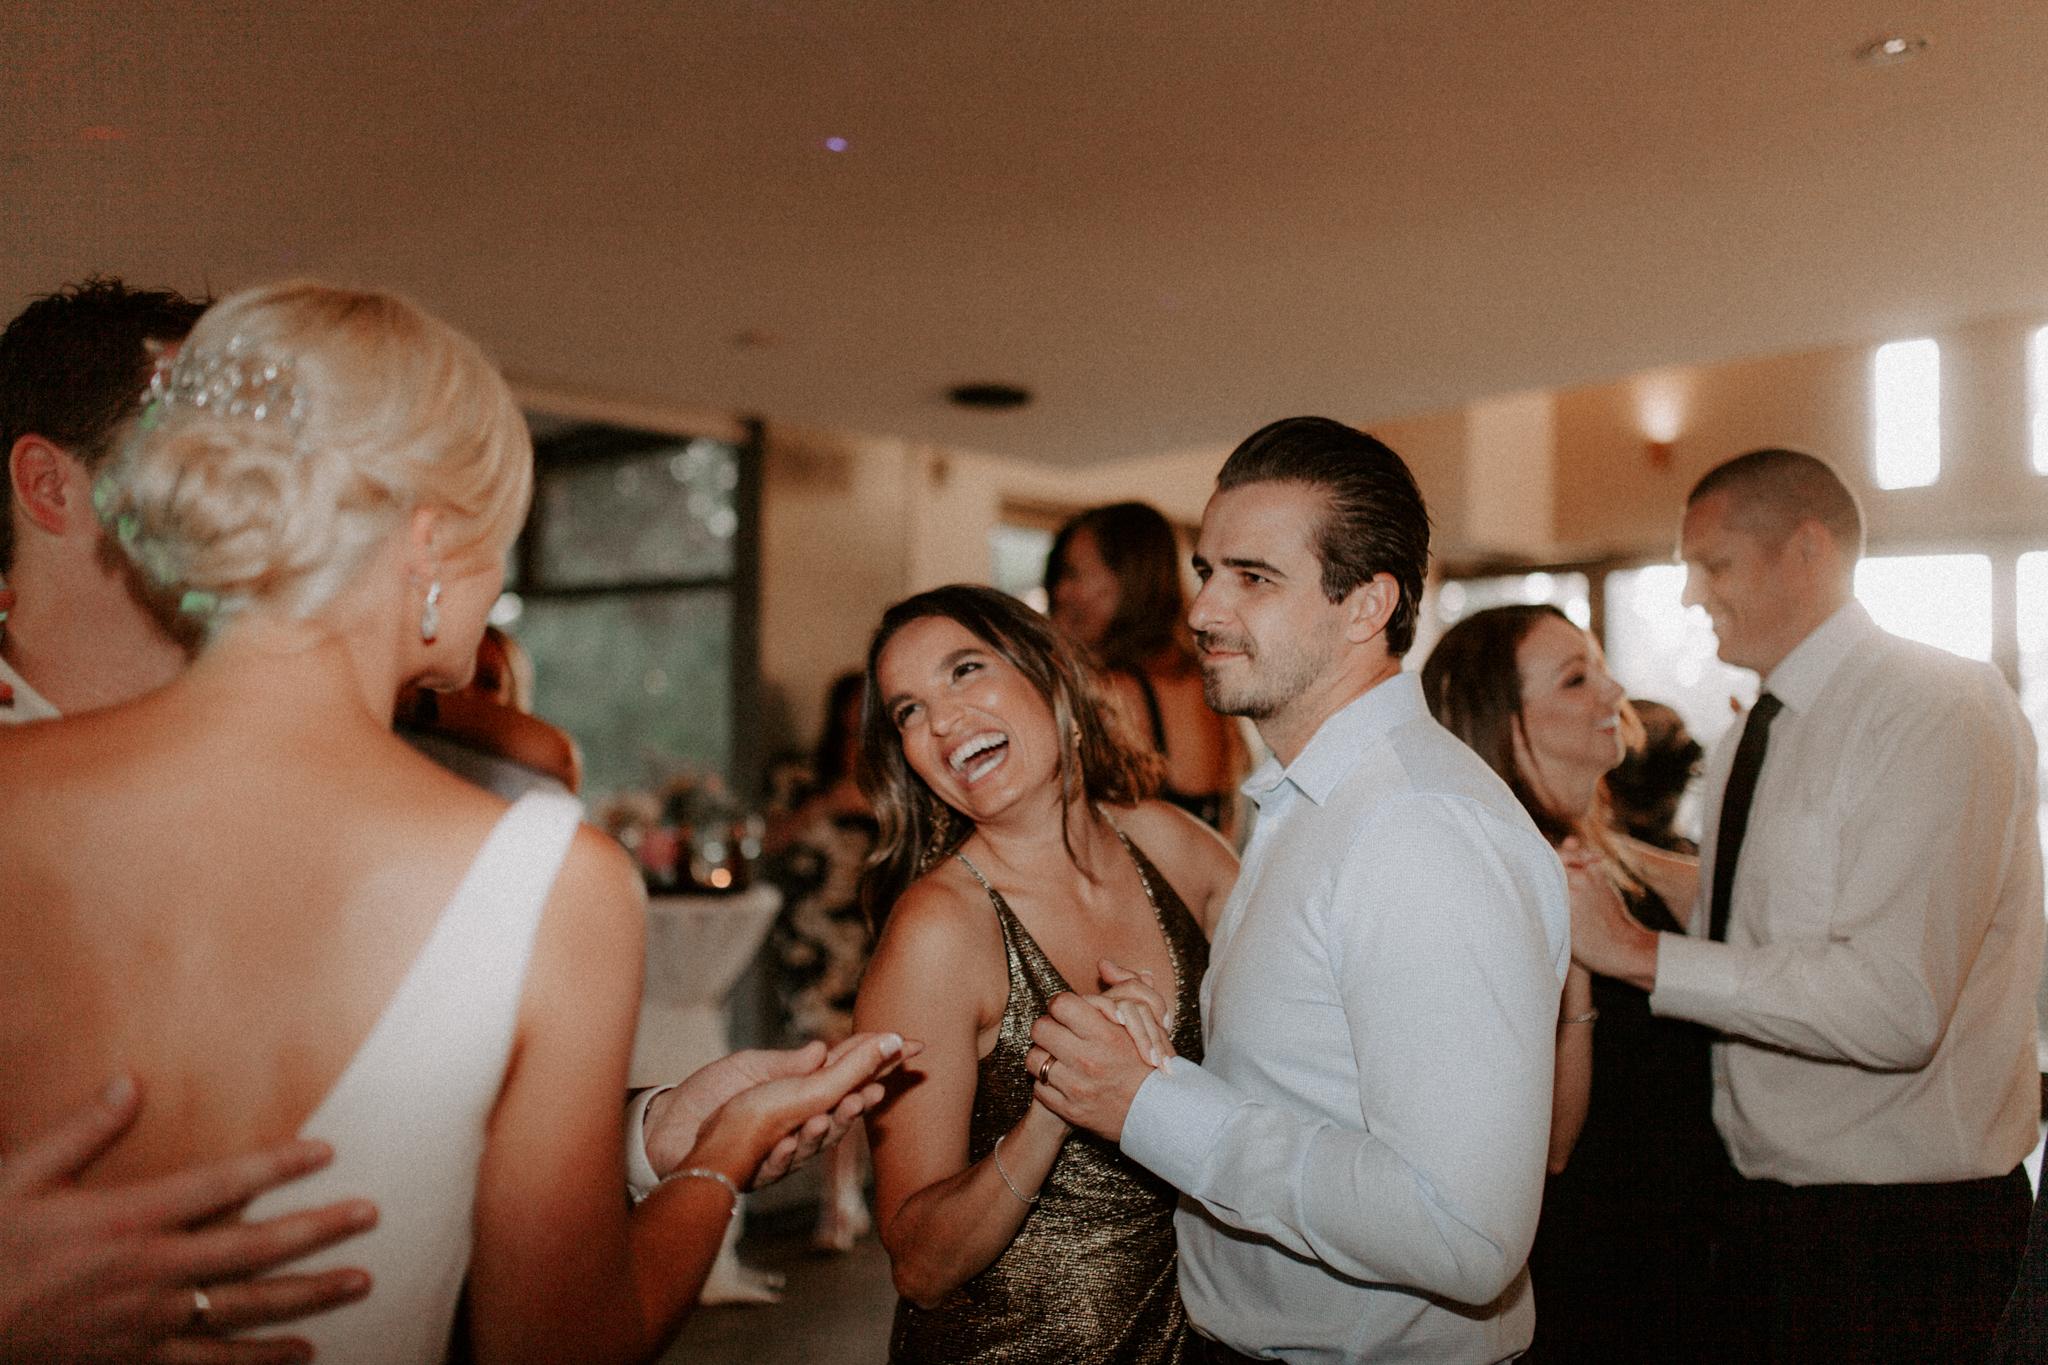 St-Kilda-Garden-Wedding-Emotions-and-Math-Photograph-211.jpg